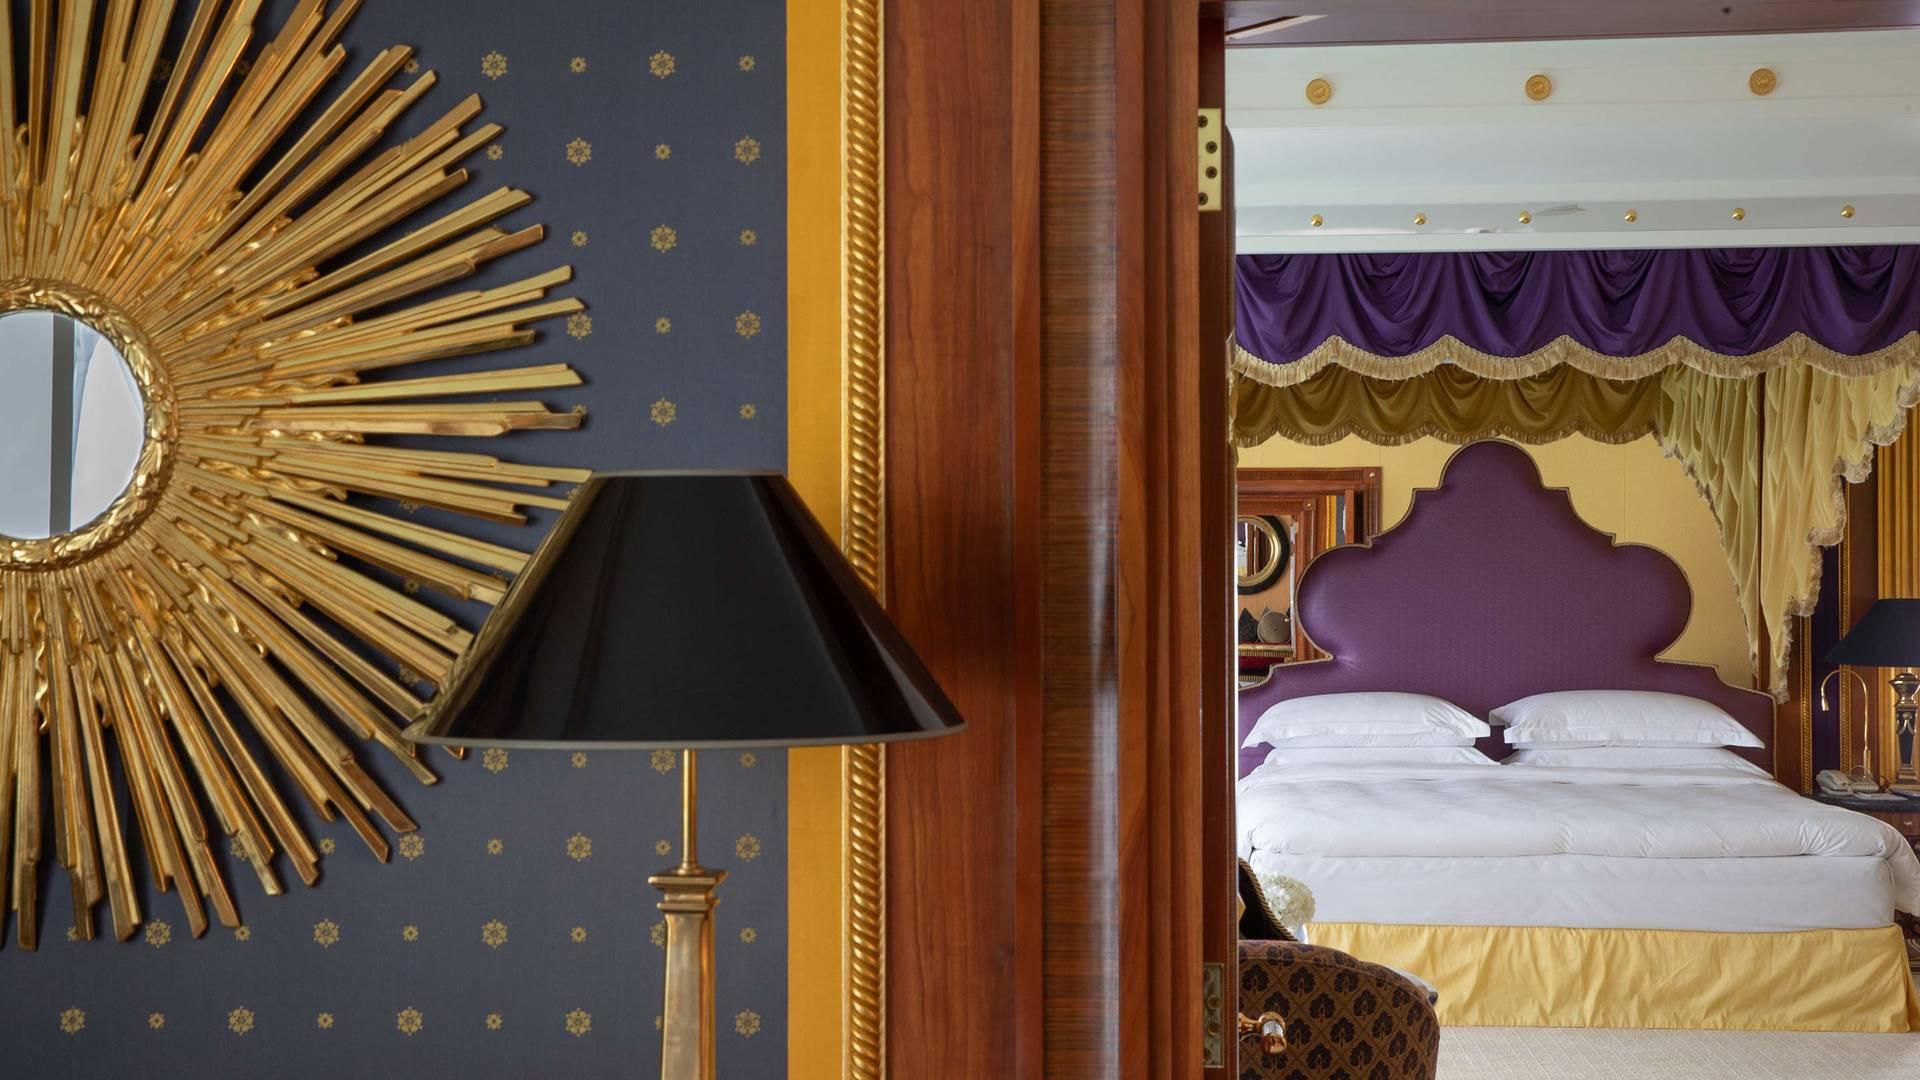 Jumeirah Burj Al Arab three bedroom suite master bedroom detail_16-9